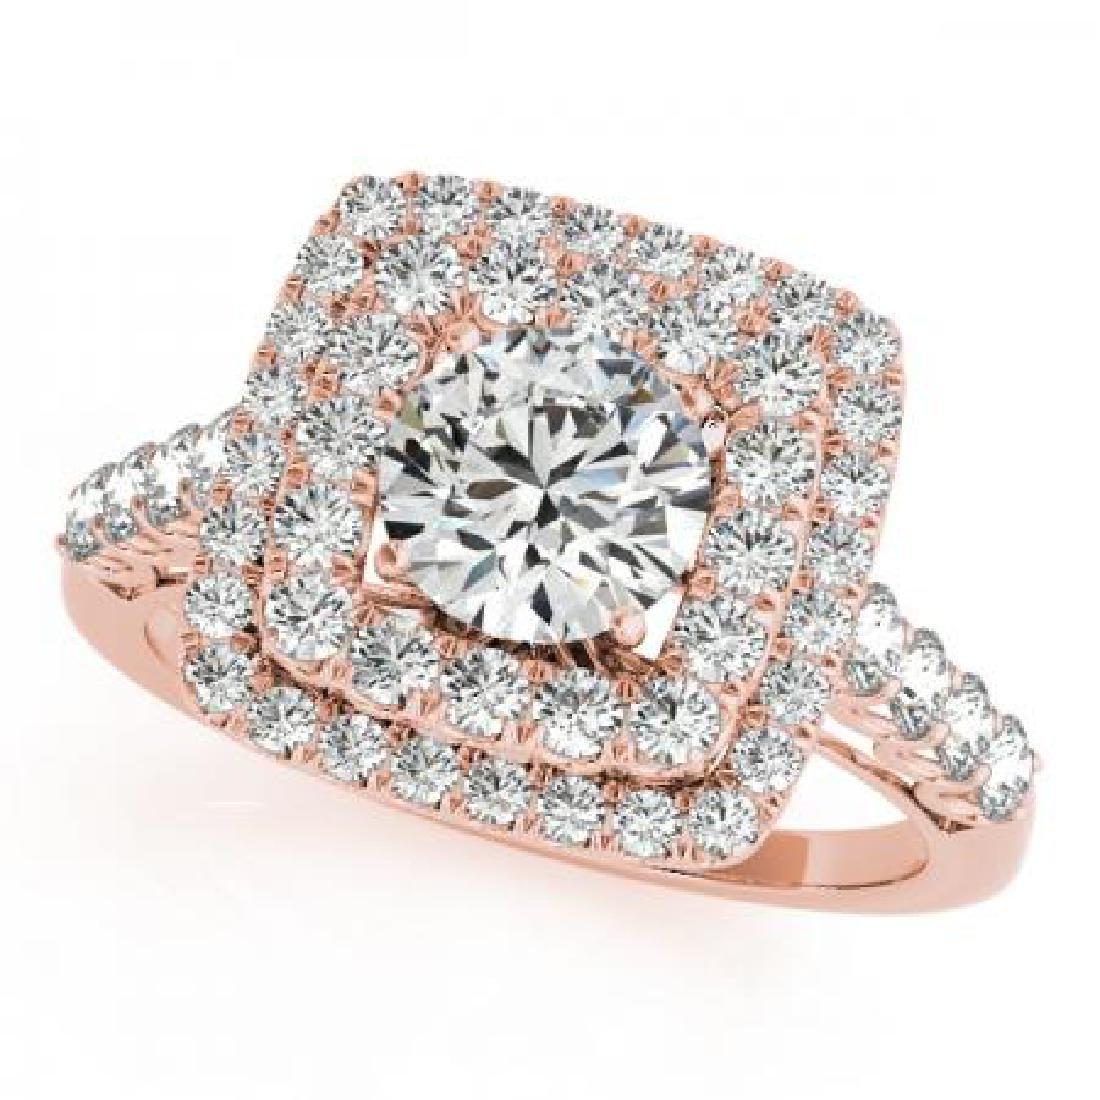 CERTIFIED 18K ROSE GOLD 2.14 CT G-H/VS-SI1 DIAMOND HALO